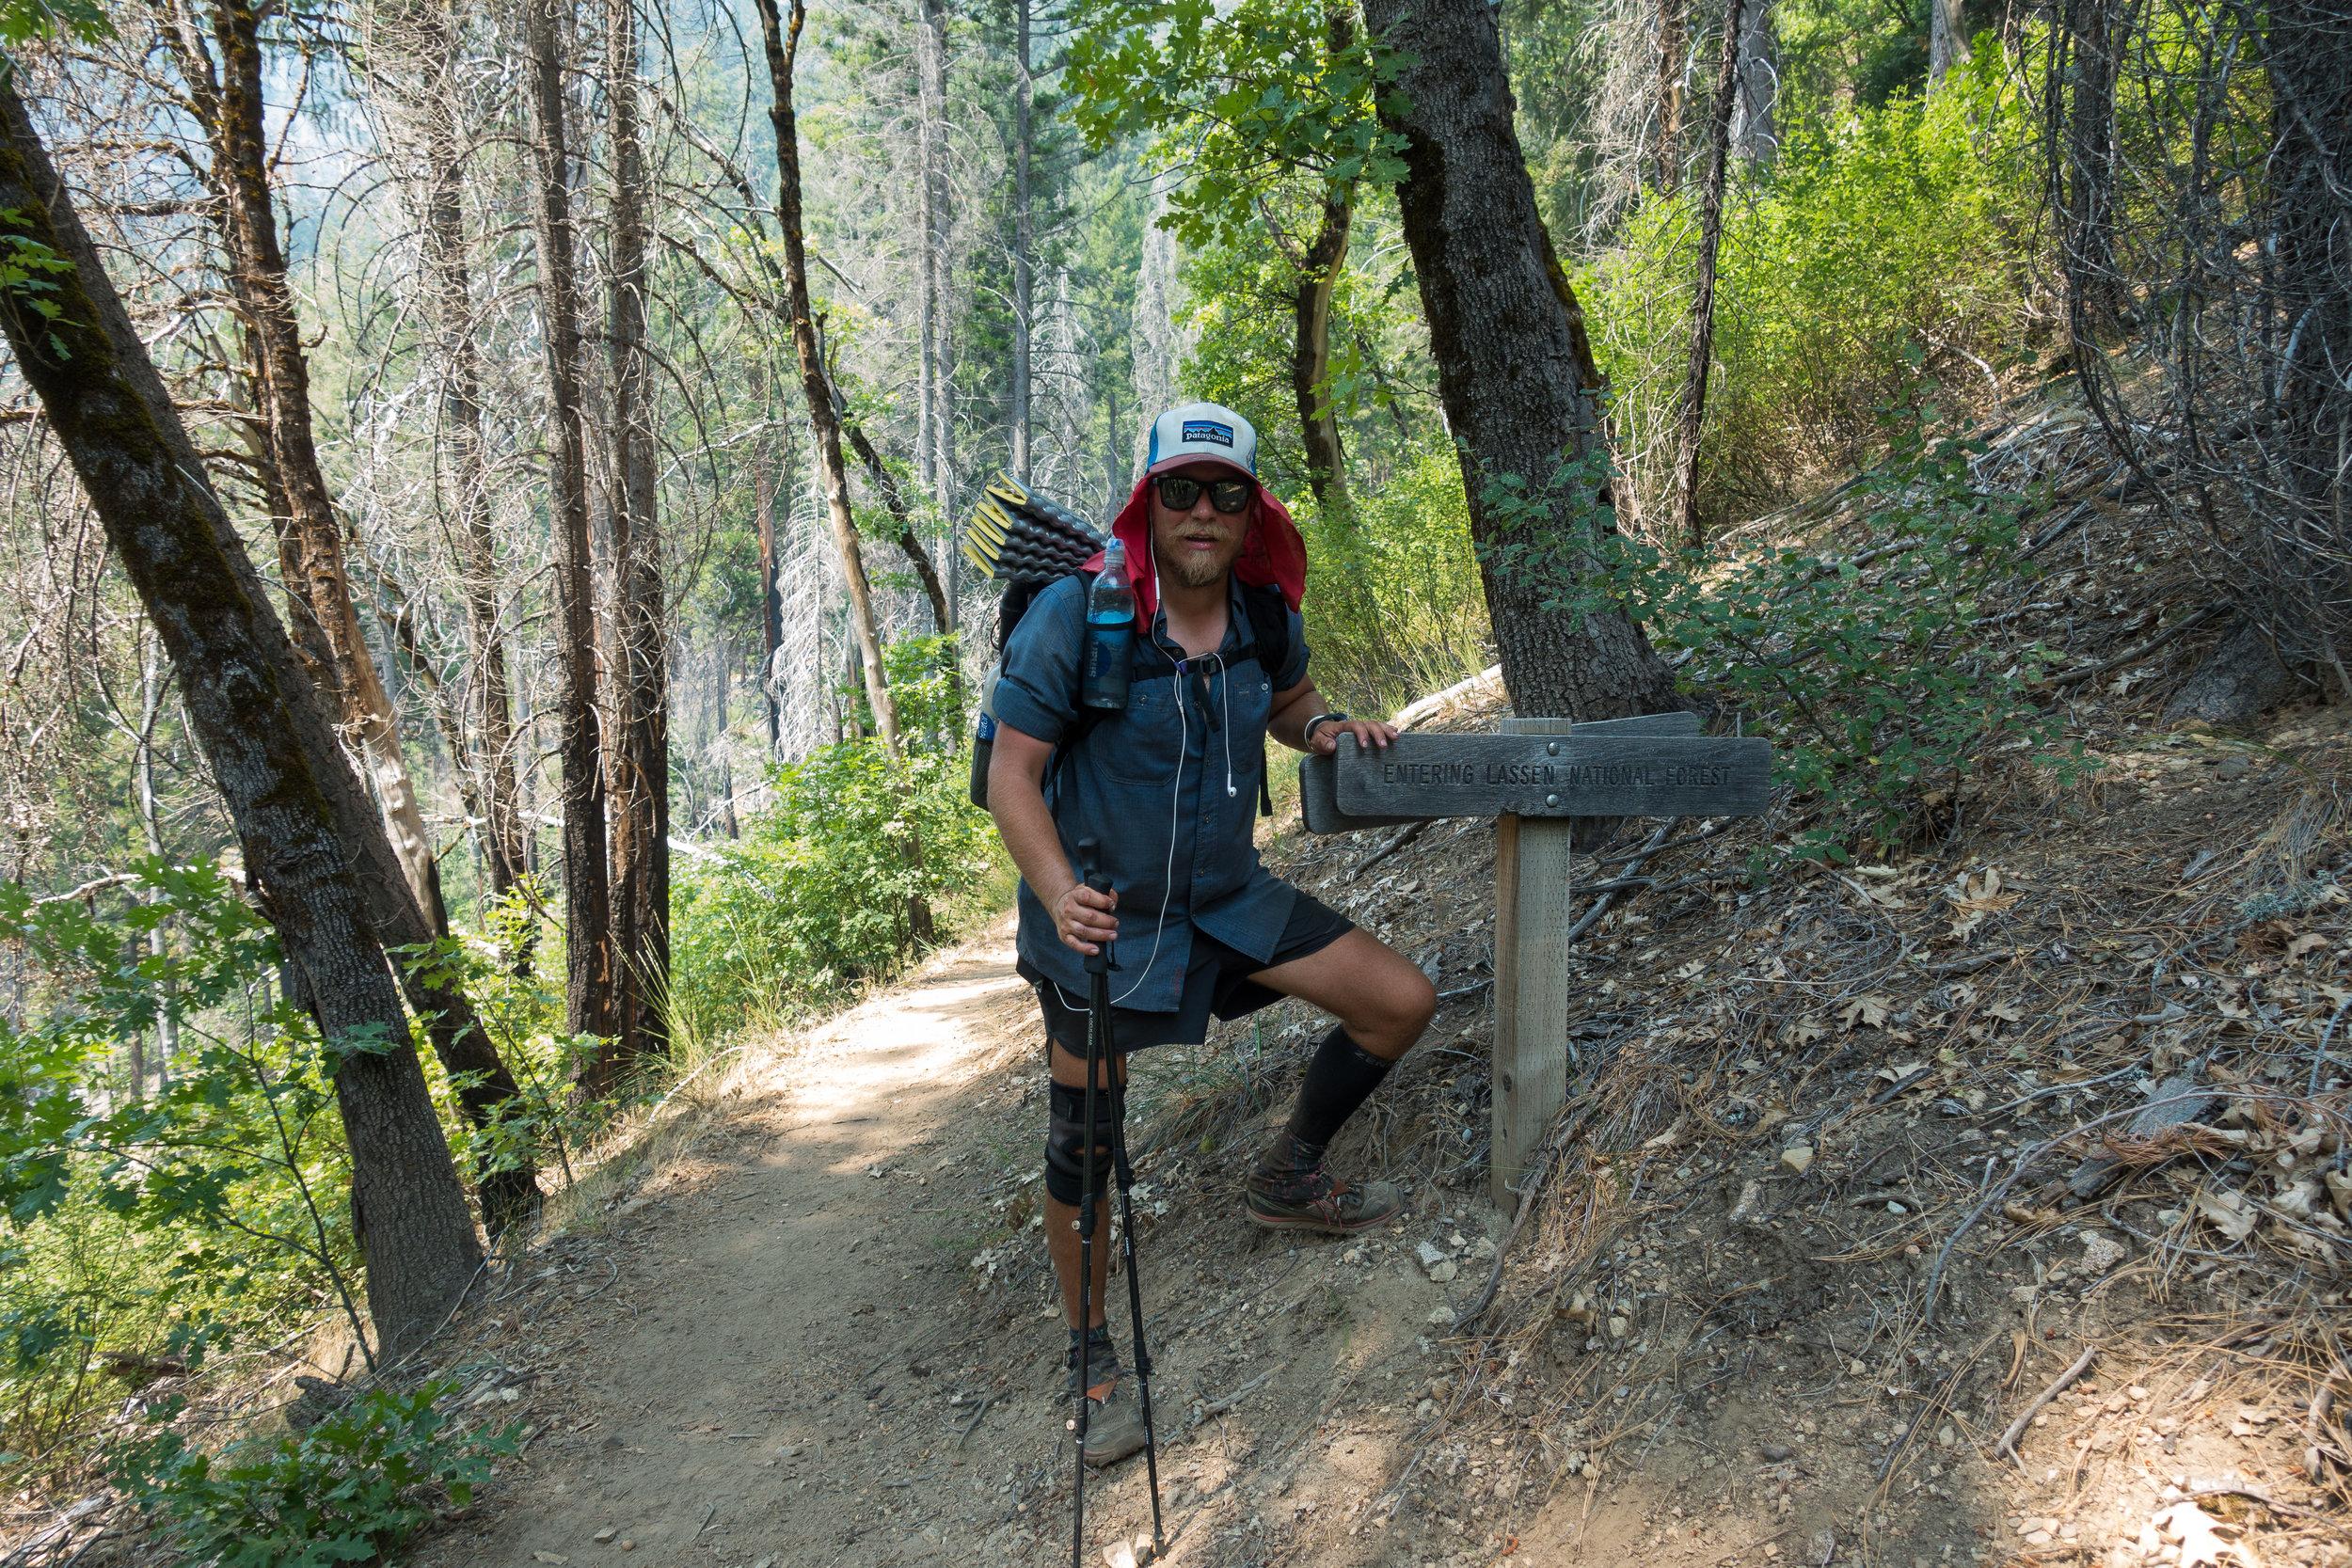 Author entering Lassen National Forest.